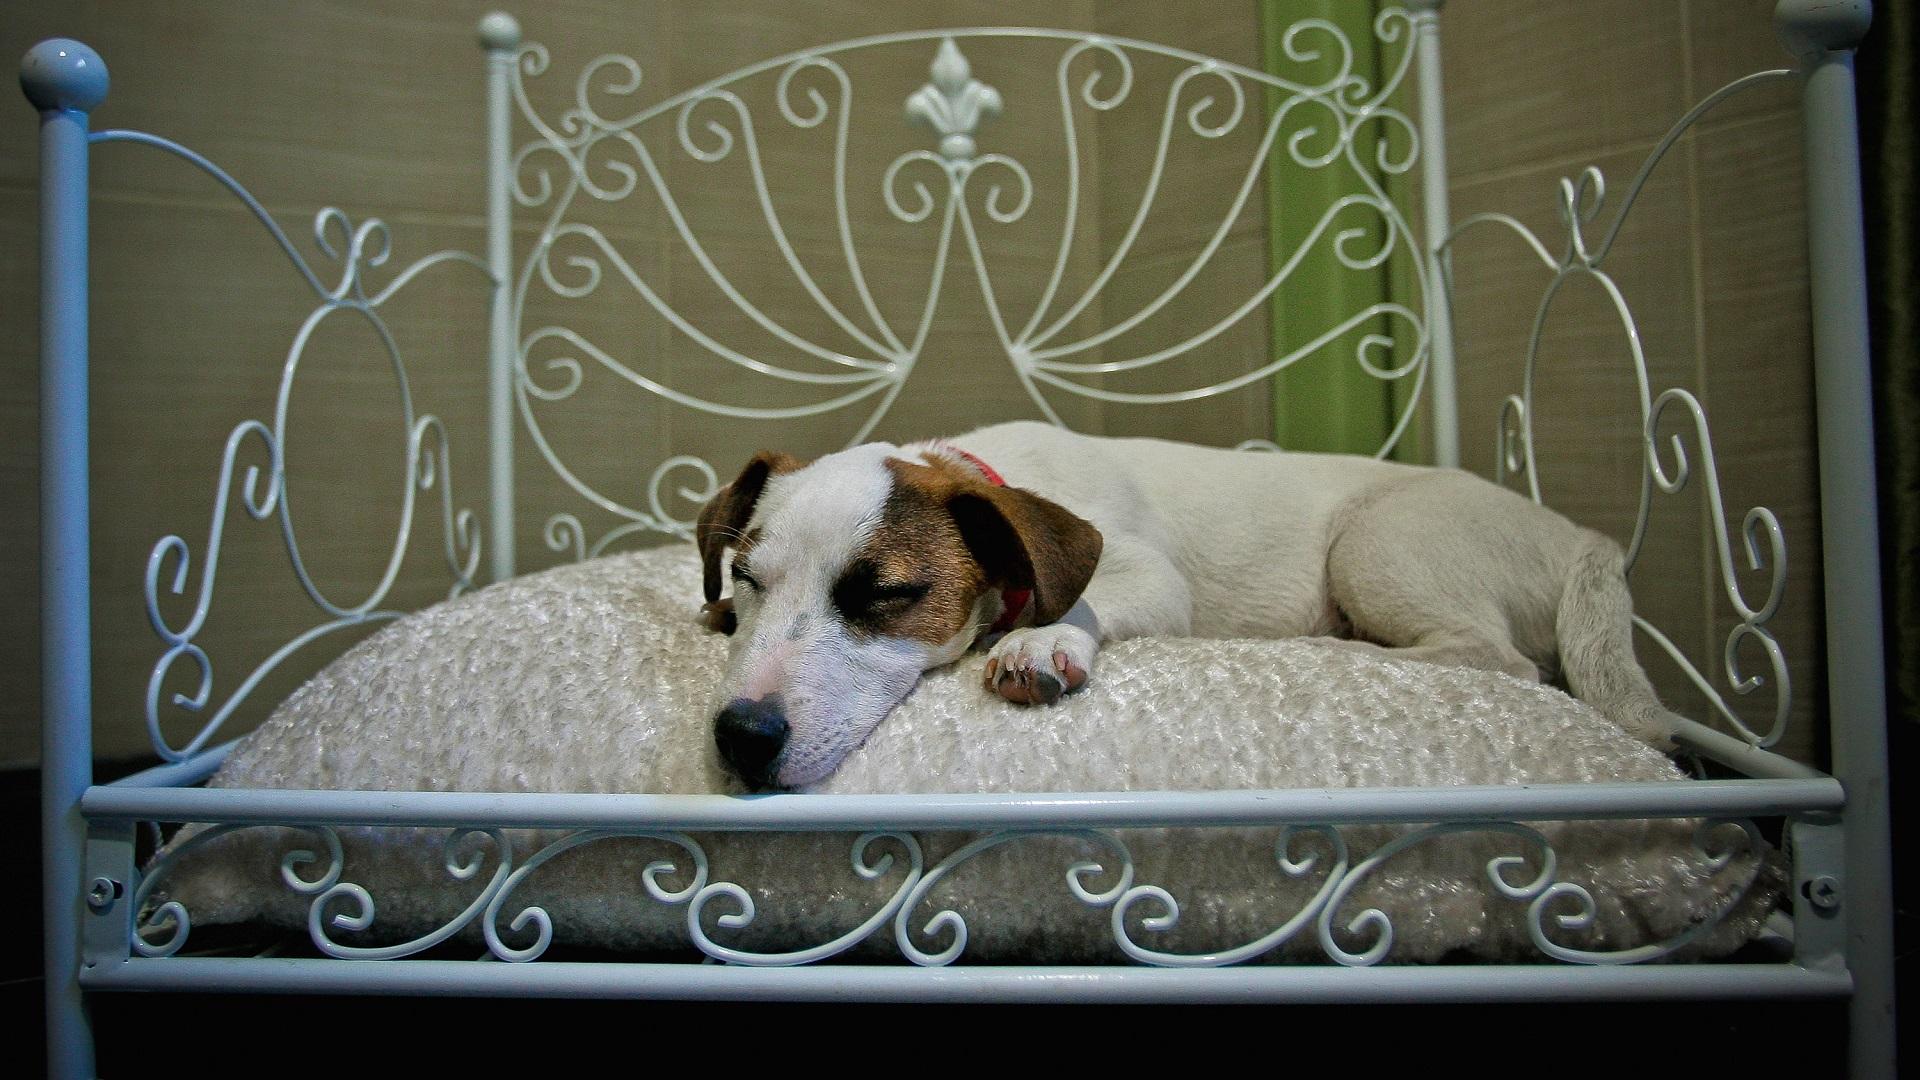 DOG SLEEPING IN BED-846652698